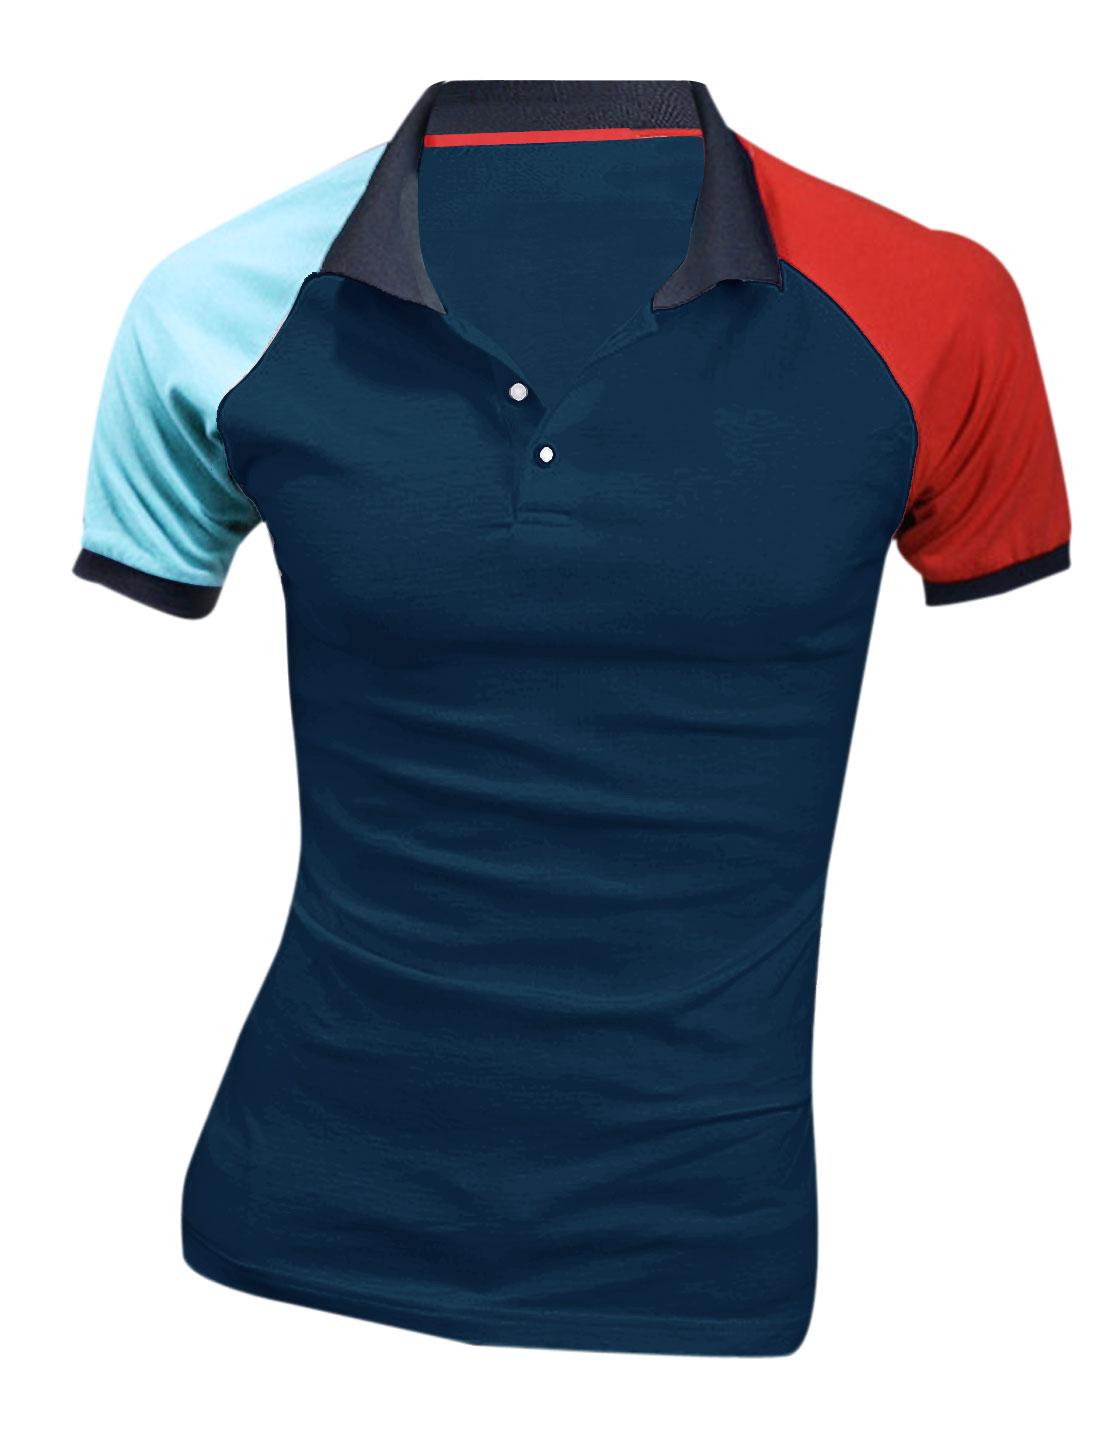 Men NEW Short Raglan Sleeve Colorblock Polo Shirt Red Navy Blue M